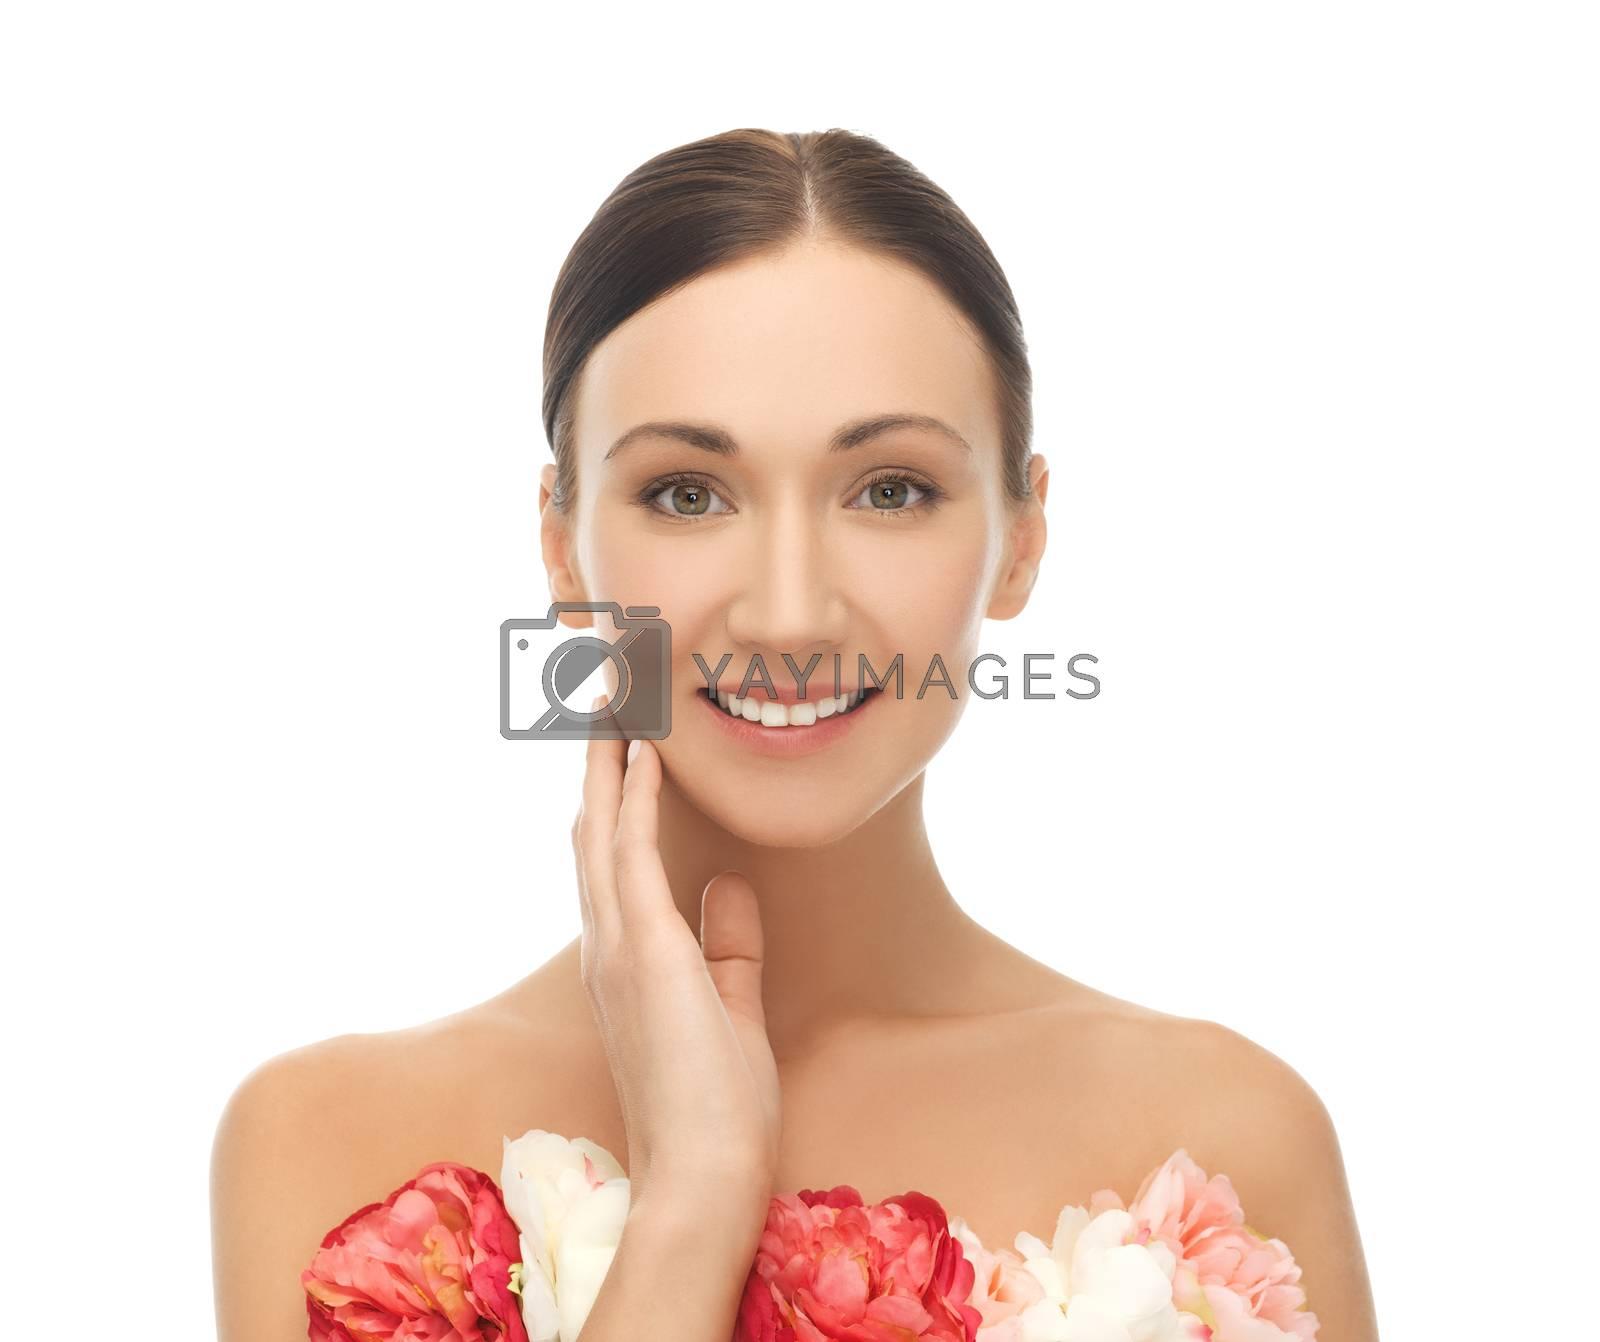 woman with flowers by dolgachov